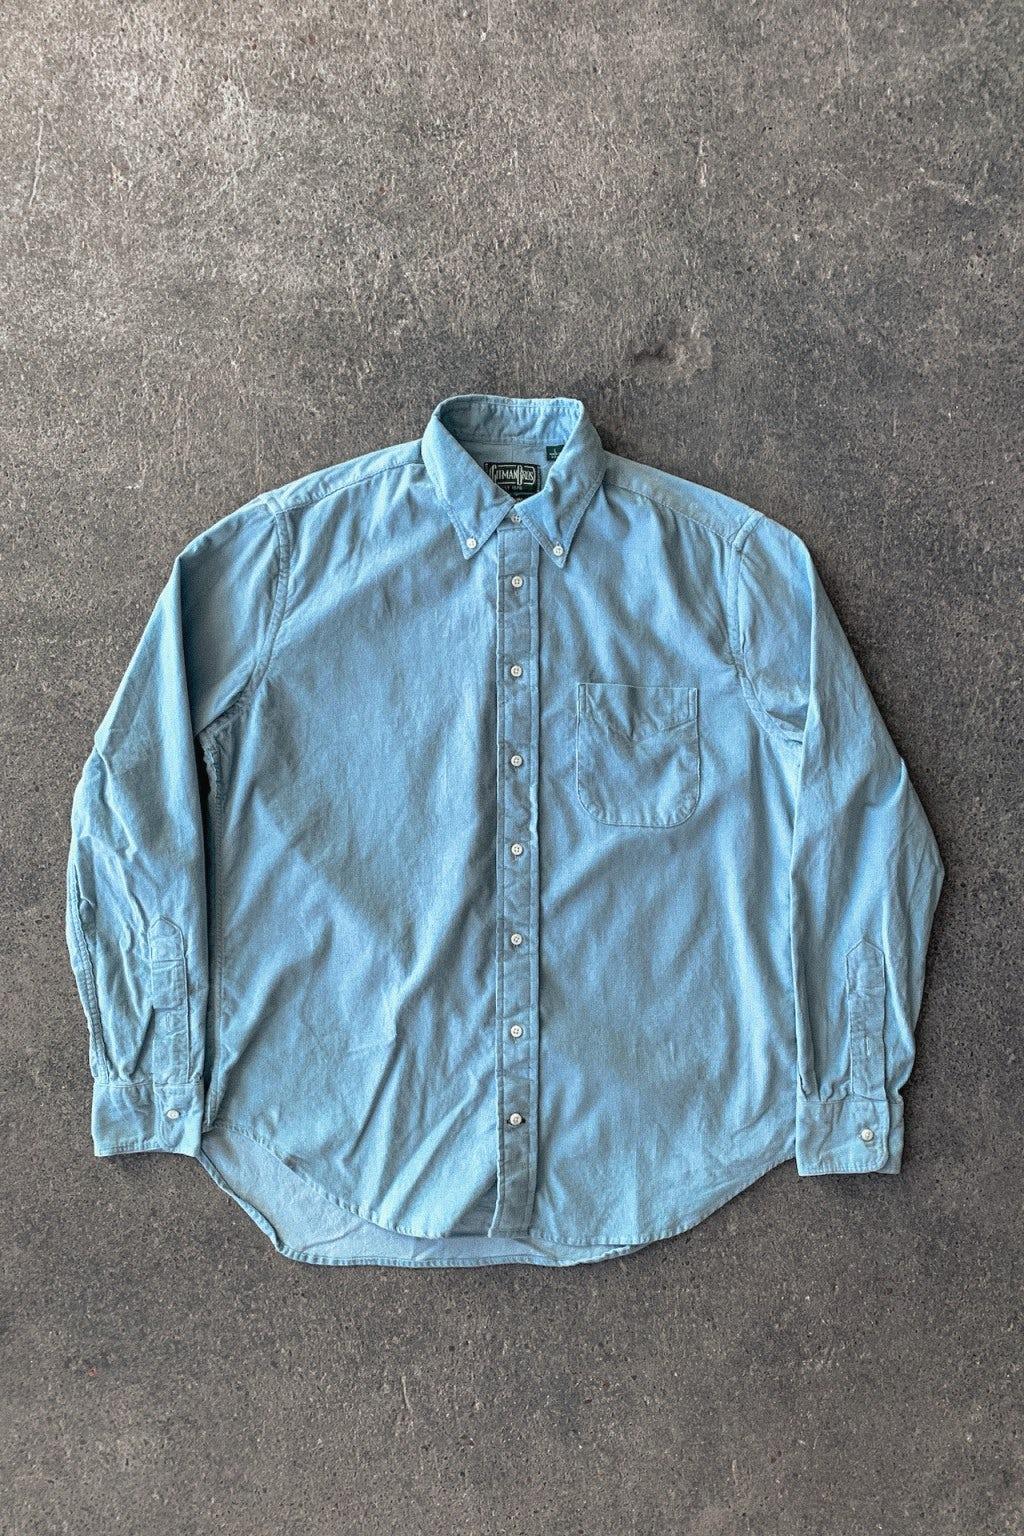 Gitman Bros. Vintage Button Down Shirt Sky Blue Corduroy